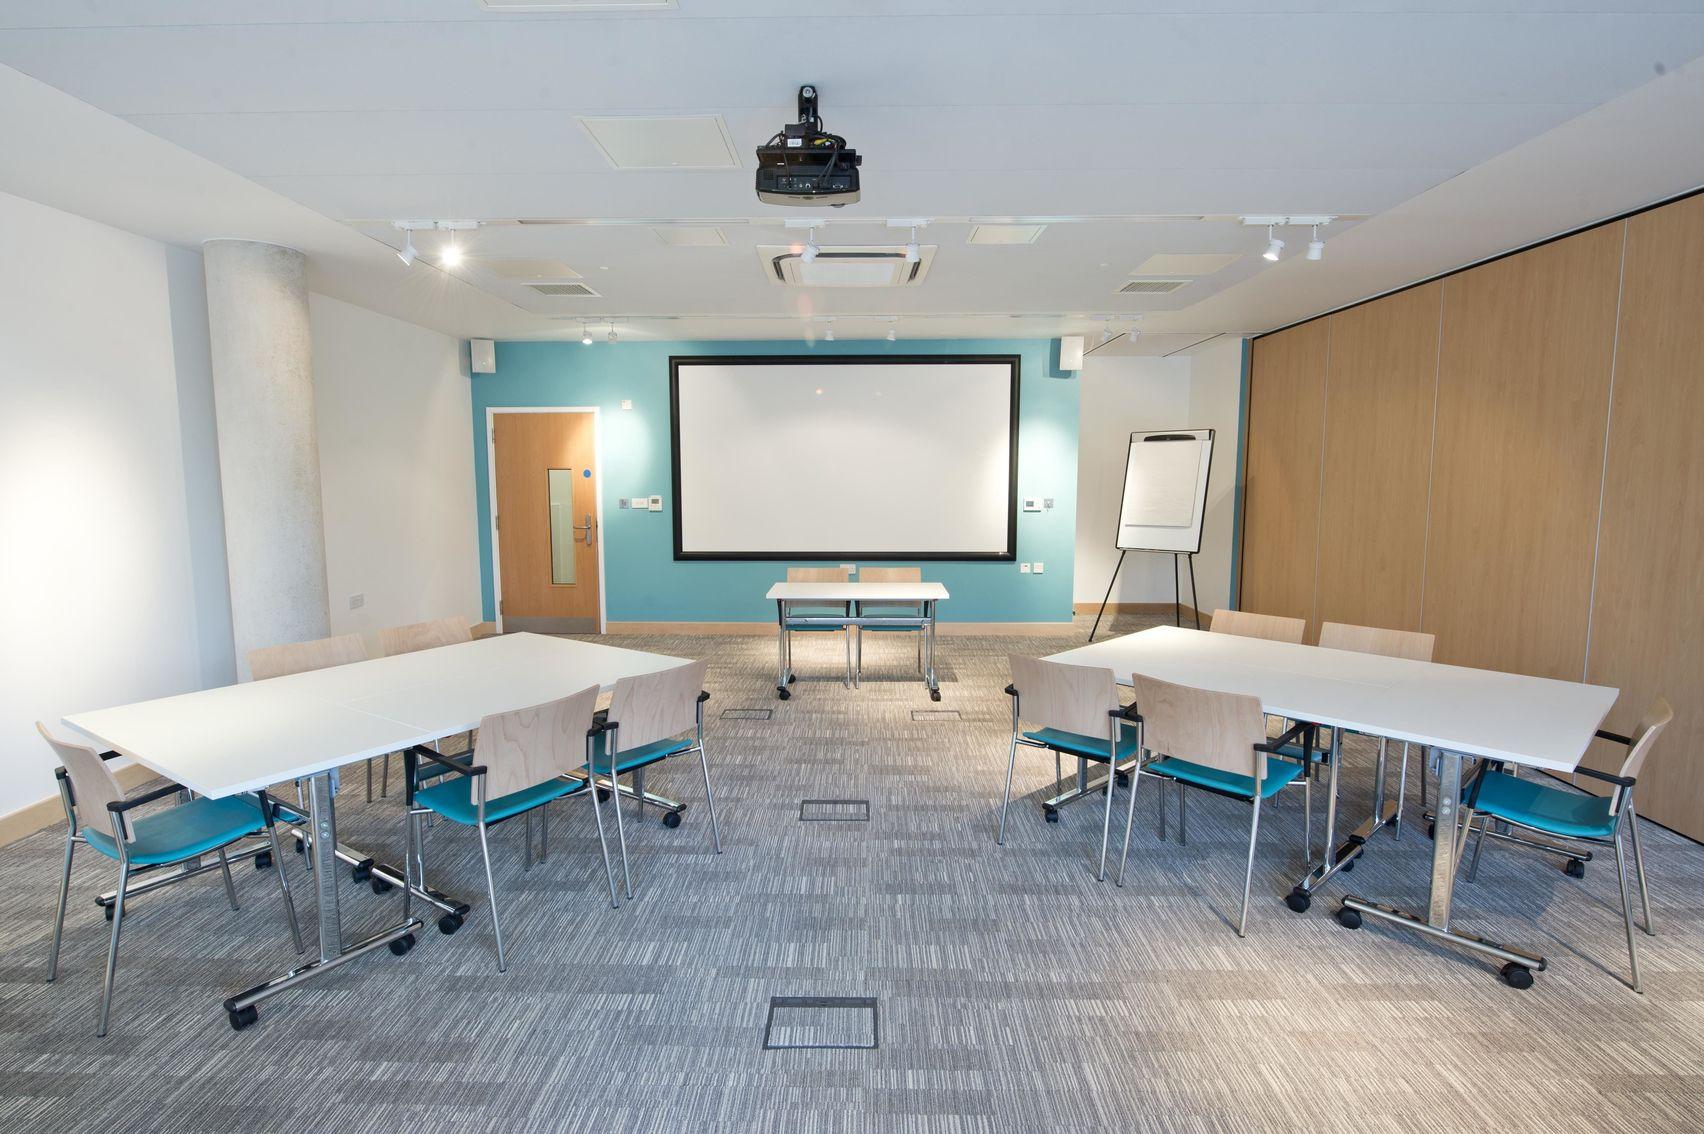 Birling, Varley Park Conference Centre, Brighton